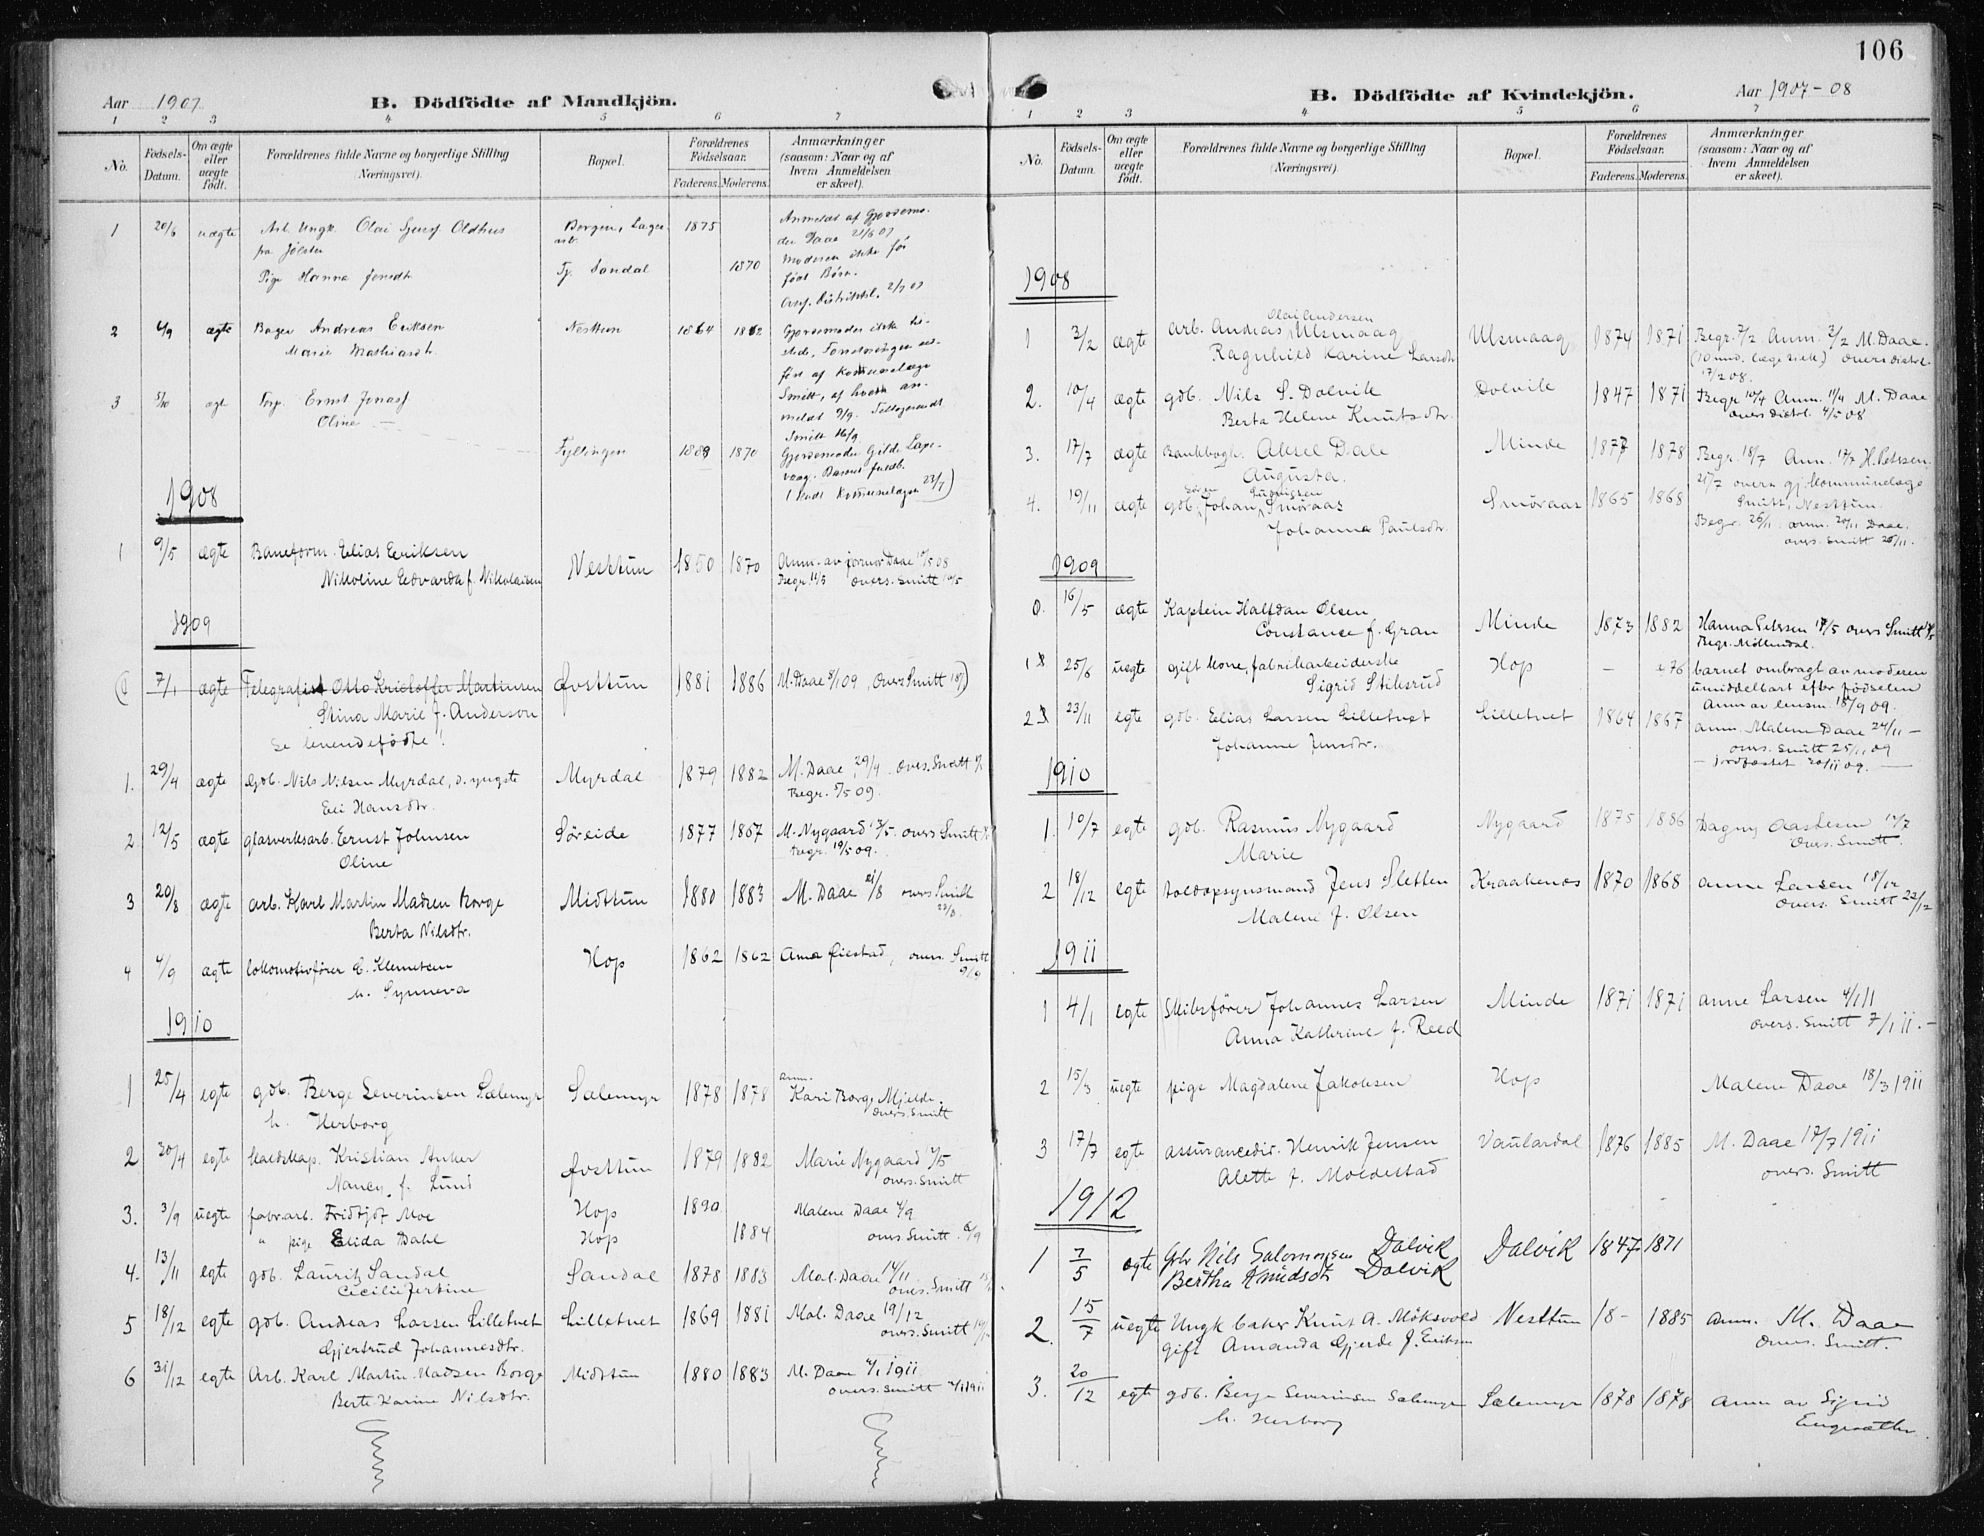 SAB, Fana Sokneprestembete, H/Haa/Haai/L0003: Parish register (official) no. I 3, 1900-1912, p. 106